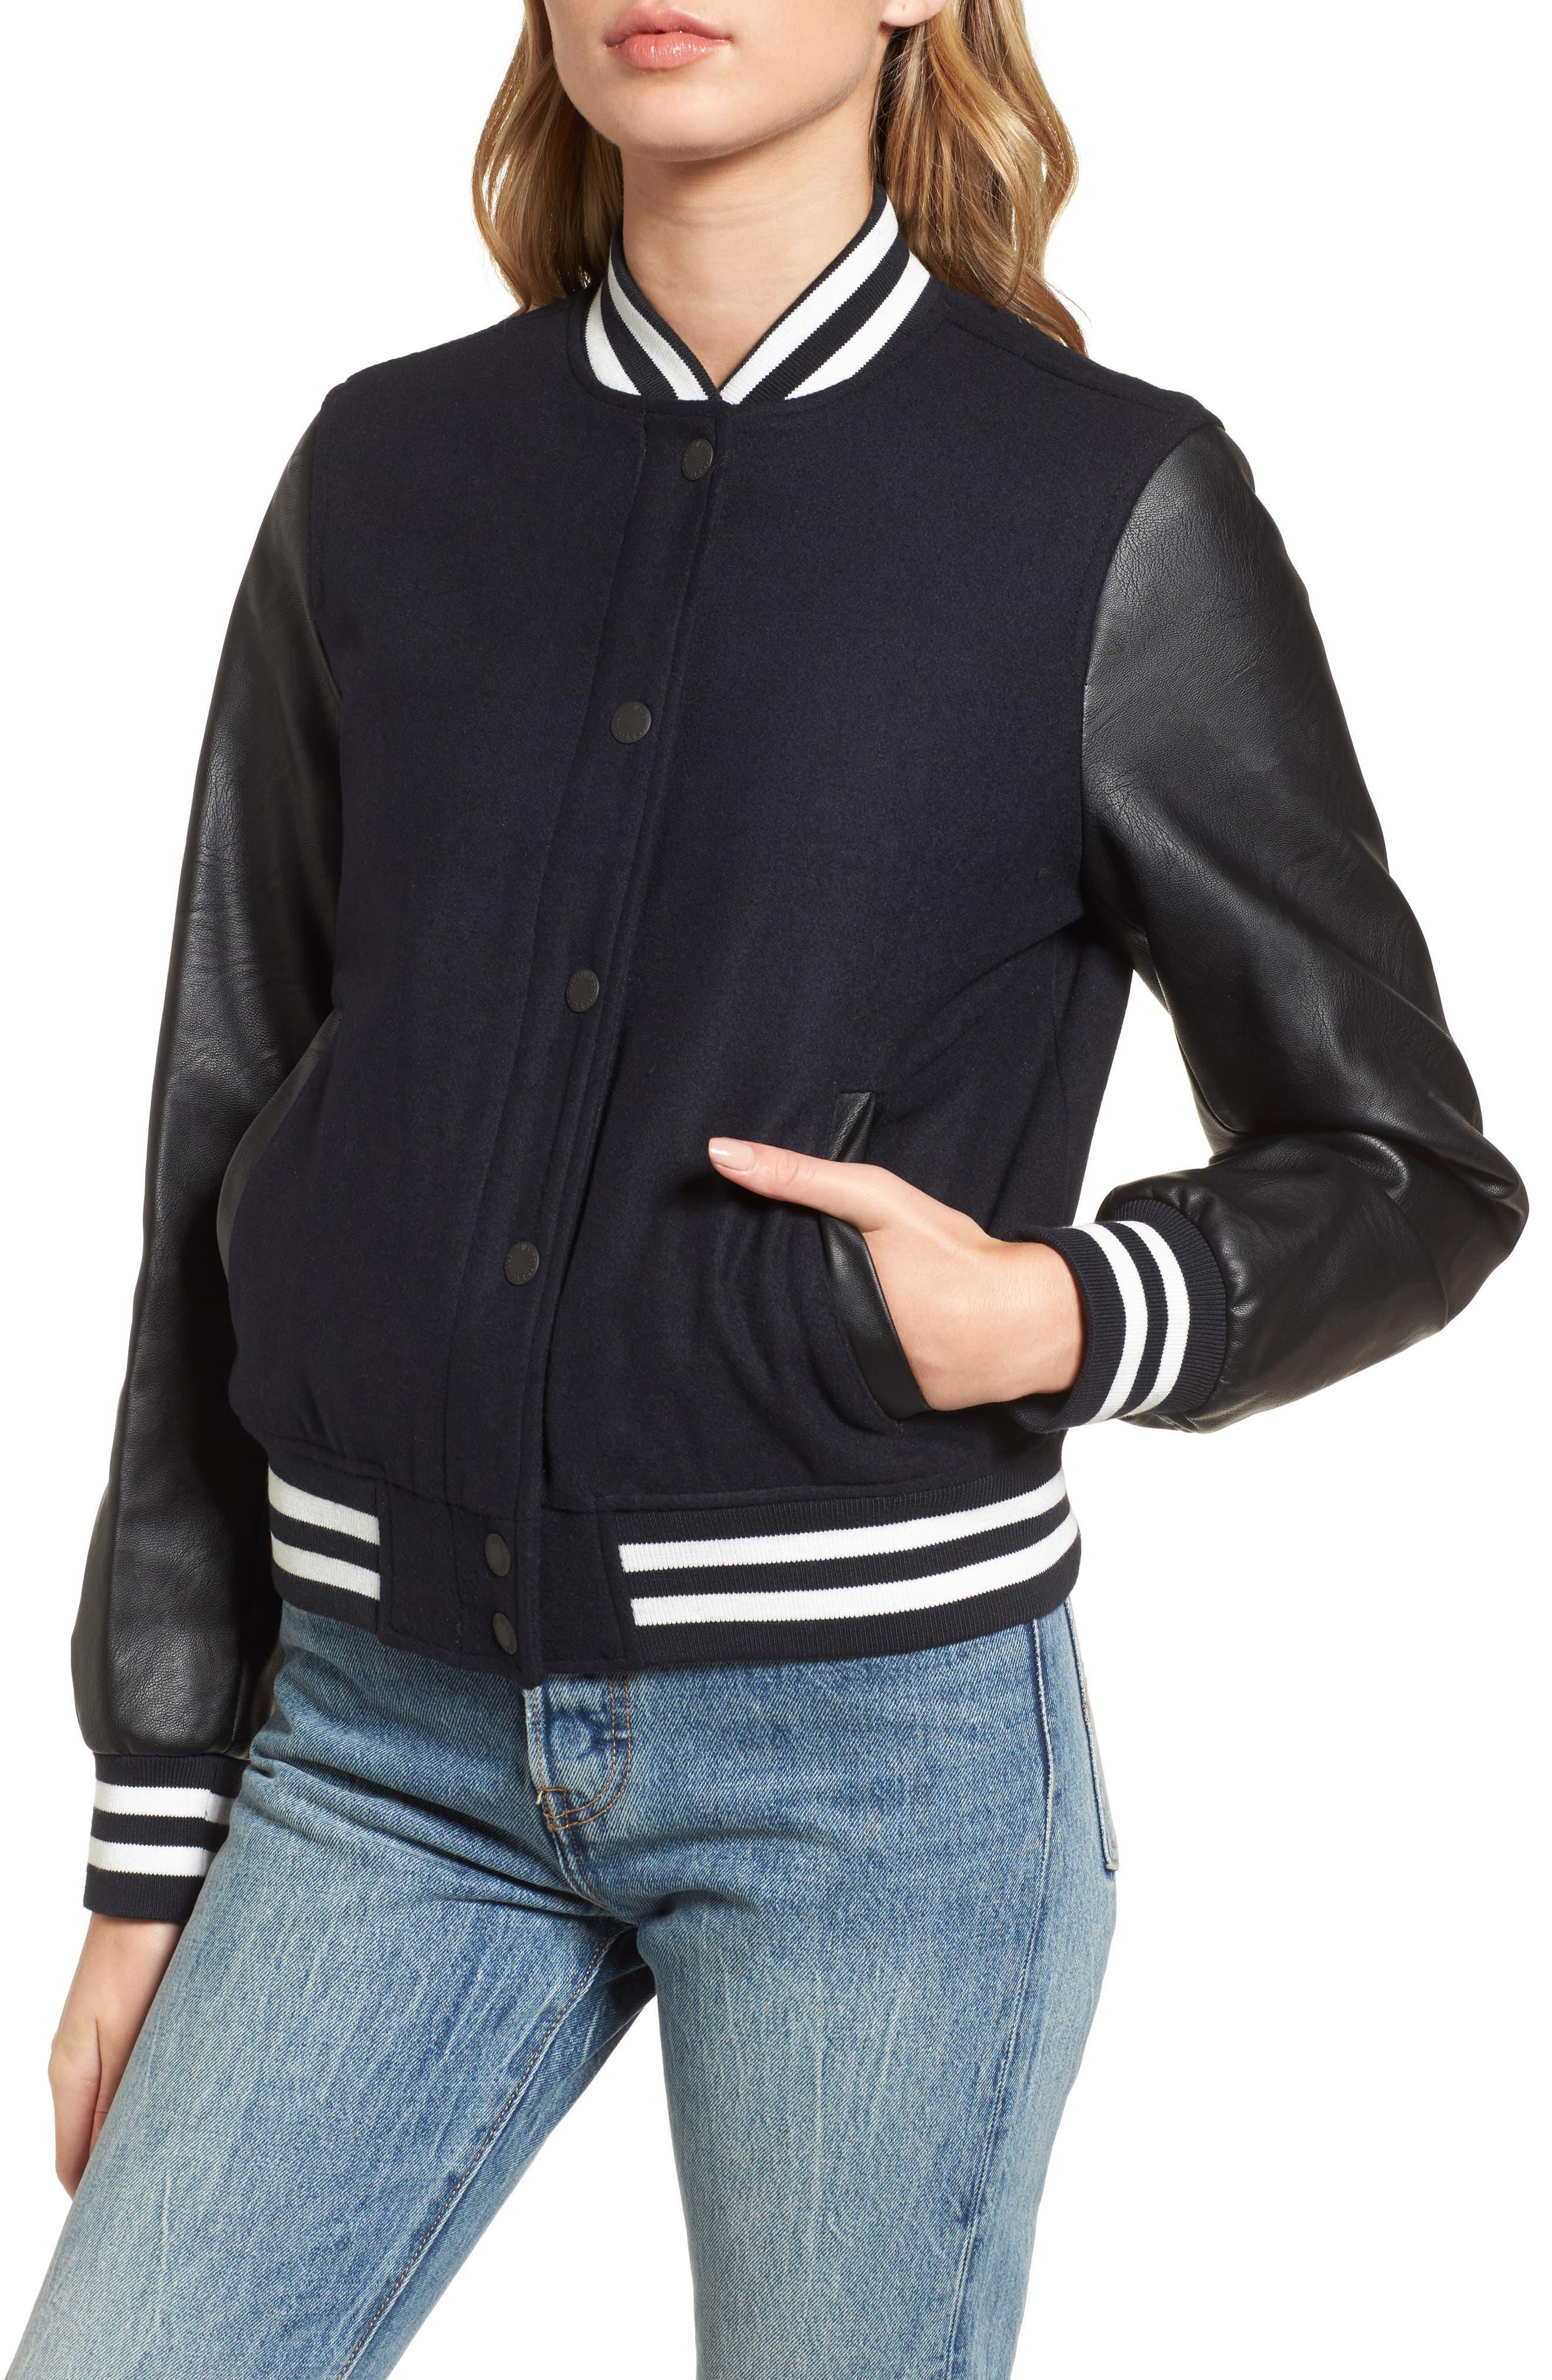 LEVIS<sup>®</sup> Mixed Media Varsity Bomber Jacket,                             Alternate thumbnail 4, color,                             410